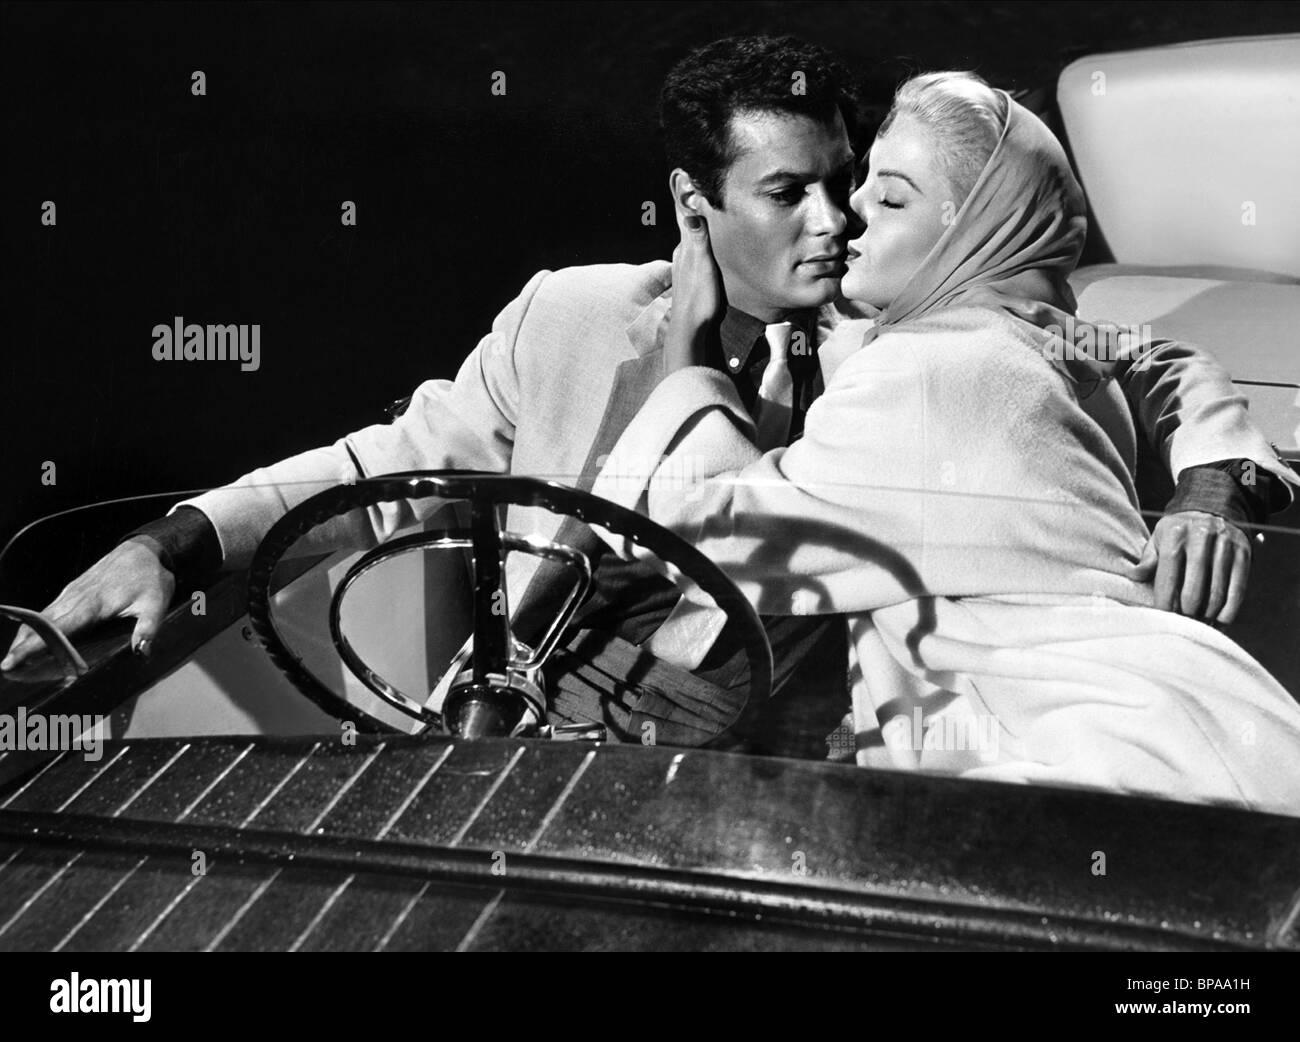 TONY CURTIS, MARTHA HYER, MISTER CORY, 1957 - Stock Image